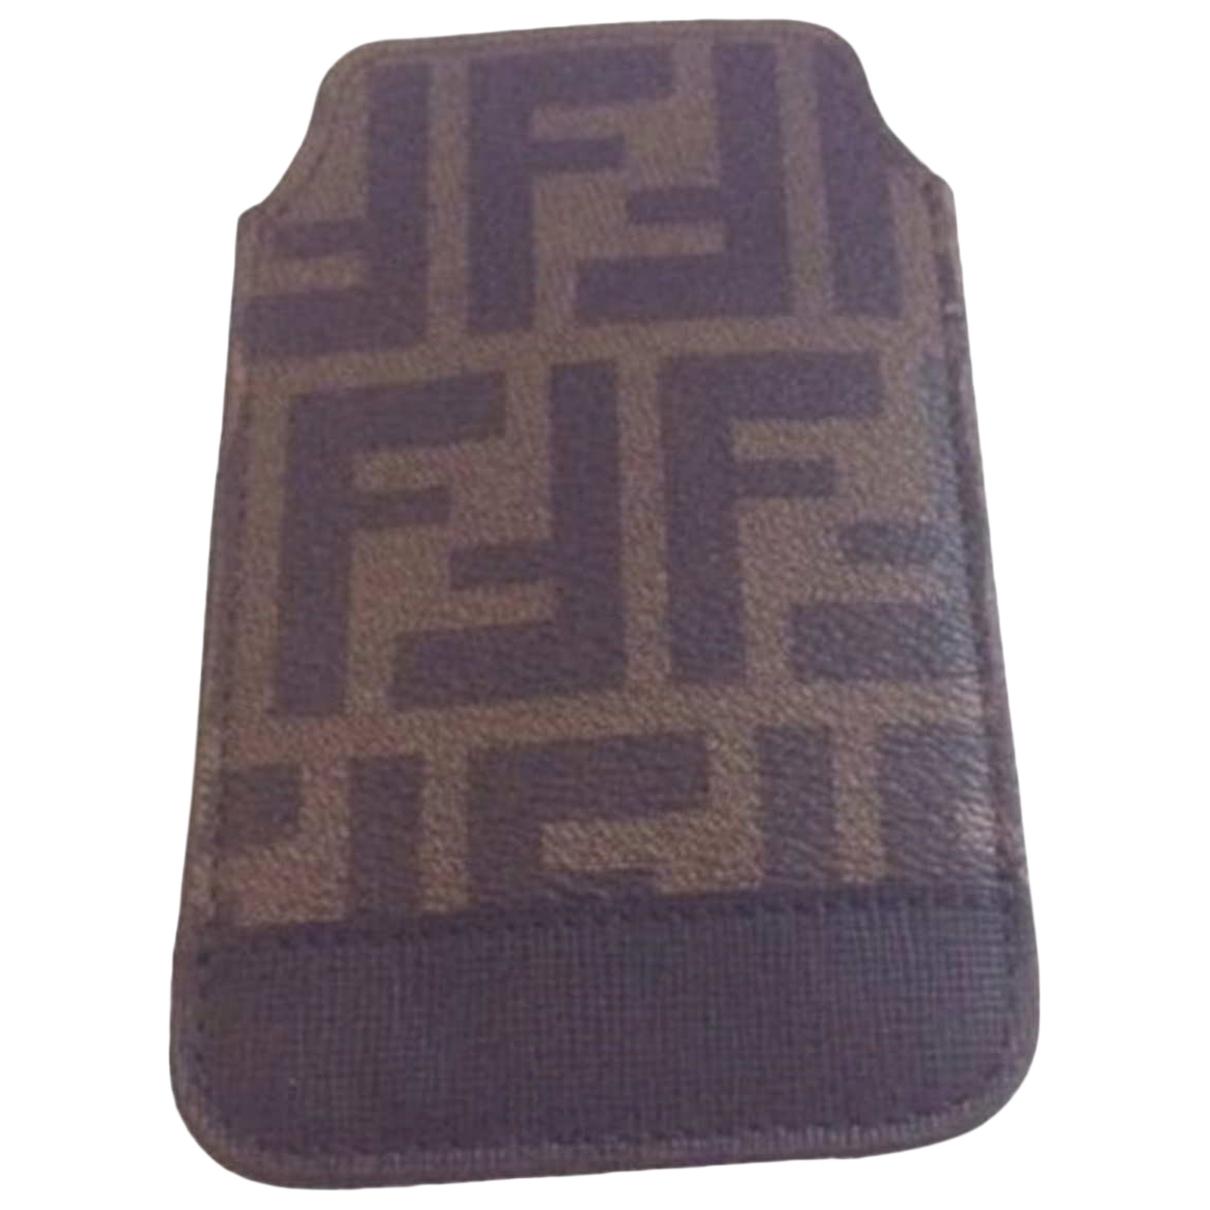 Fendi \N Brown Cloth Accessories for Life & Living \N